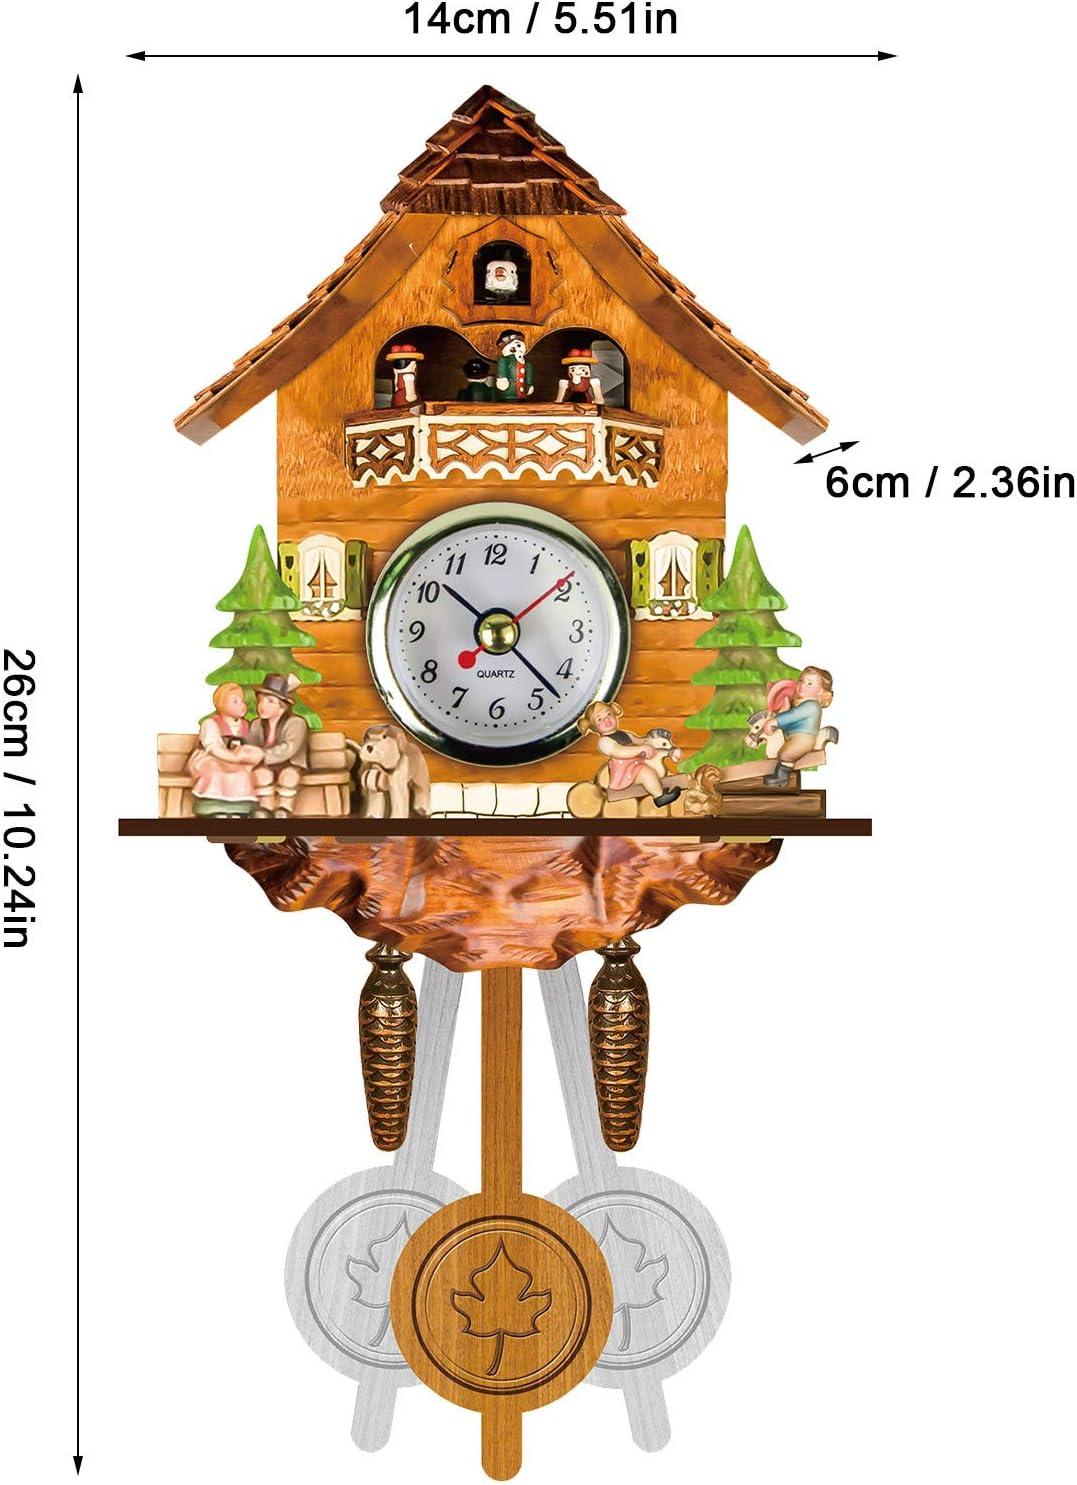 alpha-ene.co.jp Goutique Cuckoo Clocks for Wall,Cuckoo Clock ...